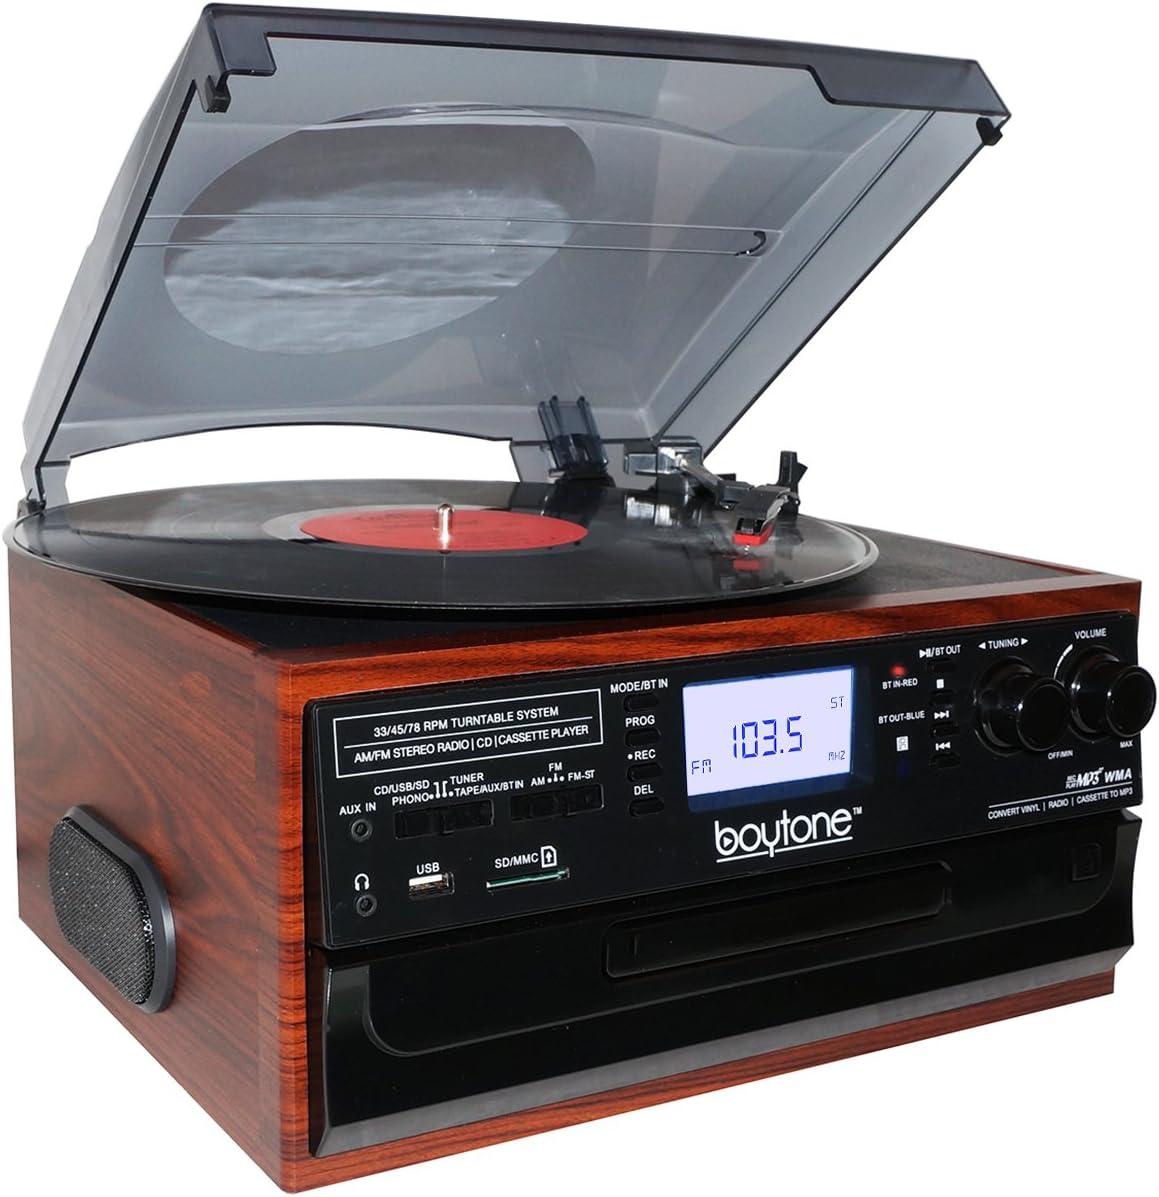 Boytone BT-22M, Bluetooth Record Player Turntable, AM/FM Radio, Cassette, CD Player, 2 built in speaker, Ability to convert Vinyl, Radio, Cassette, CD ...